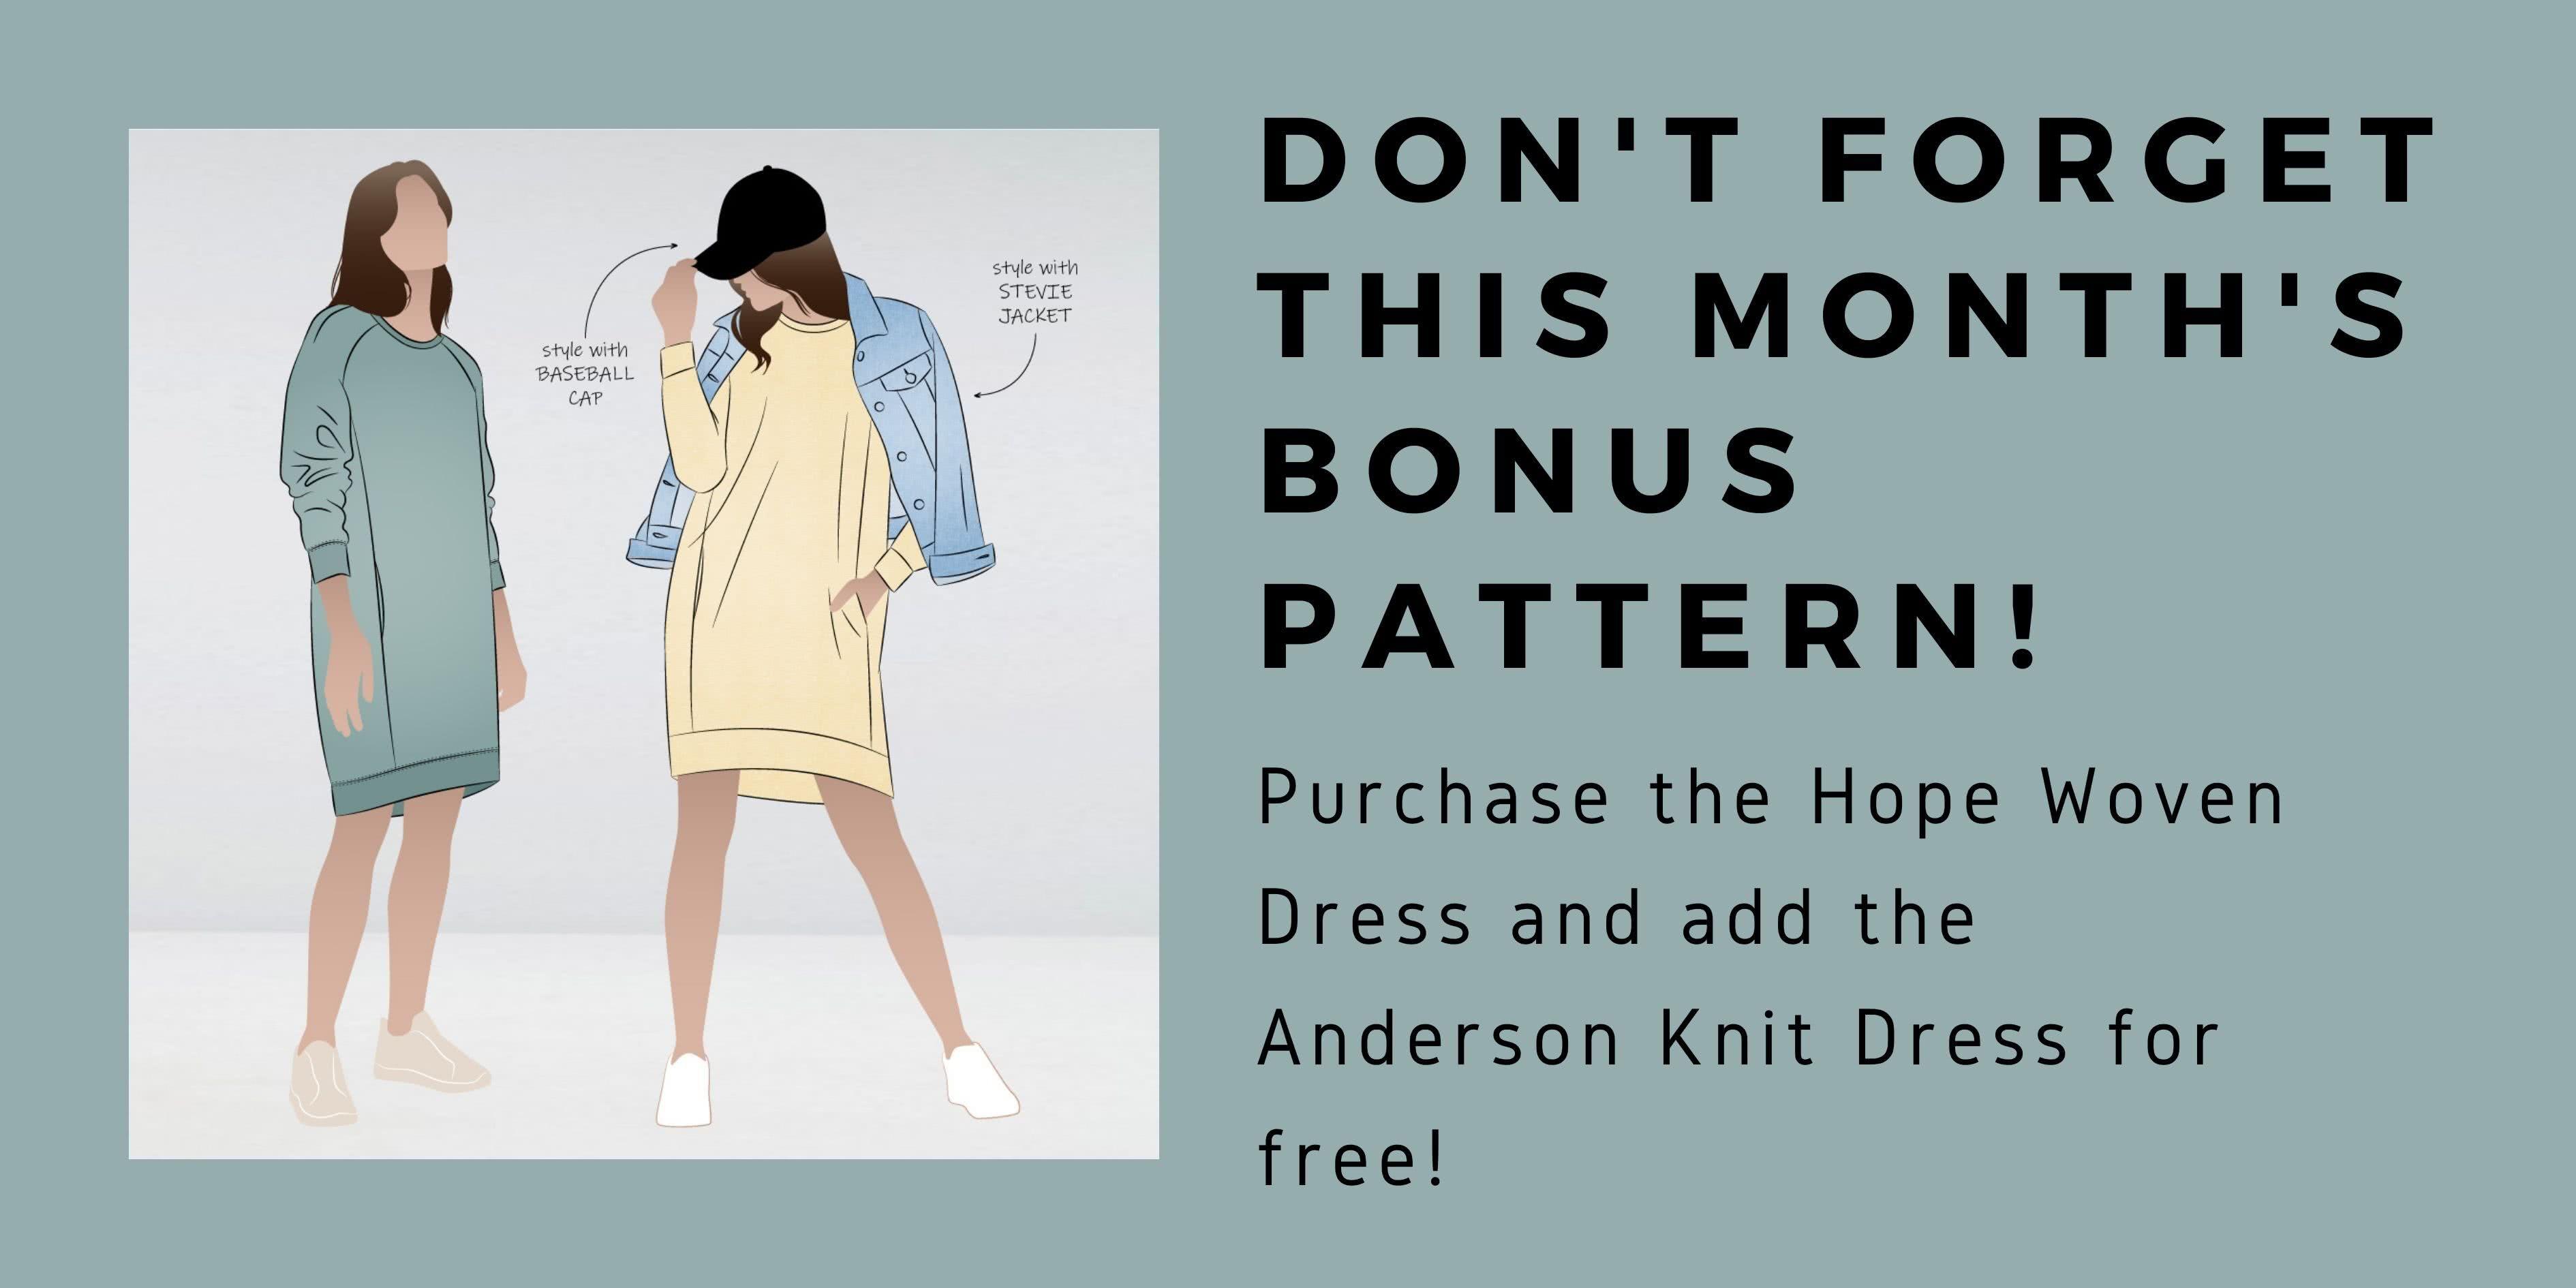 This Month's Bonus Pattern!